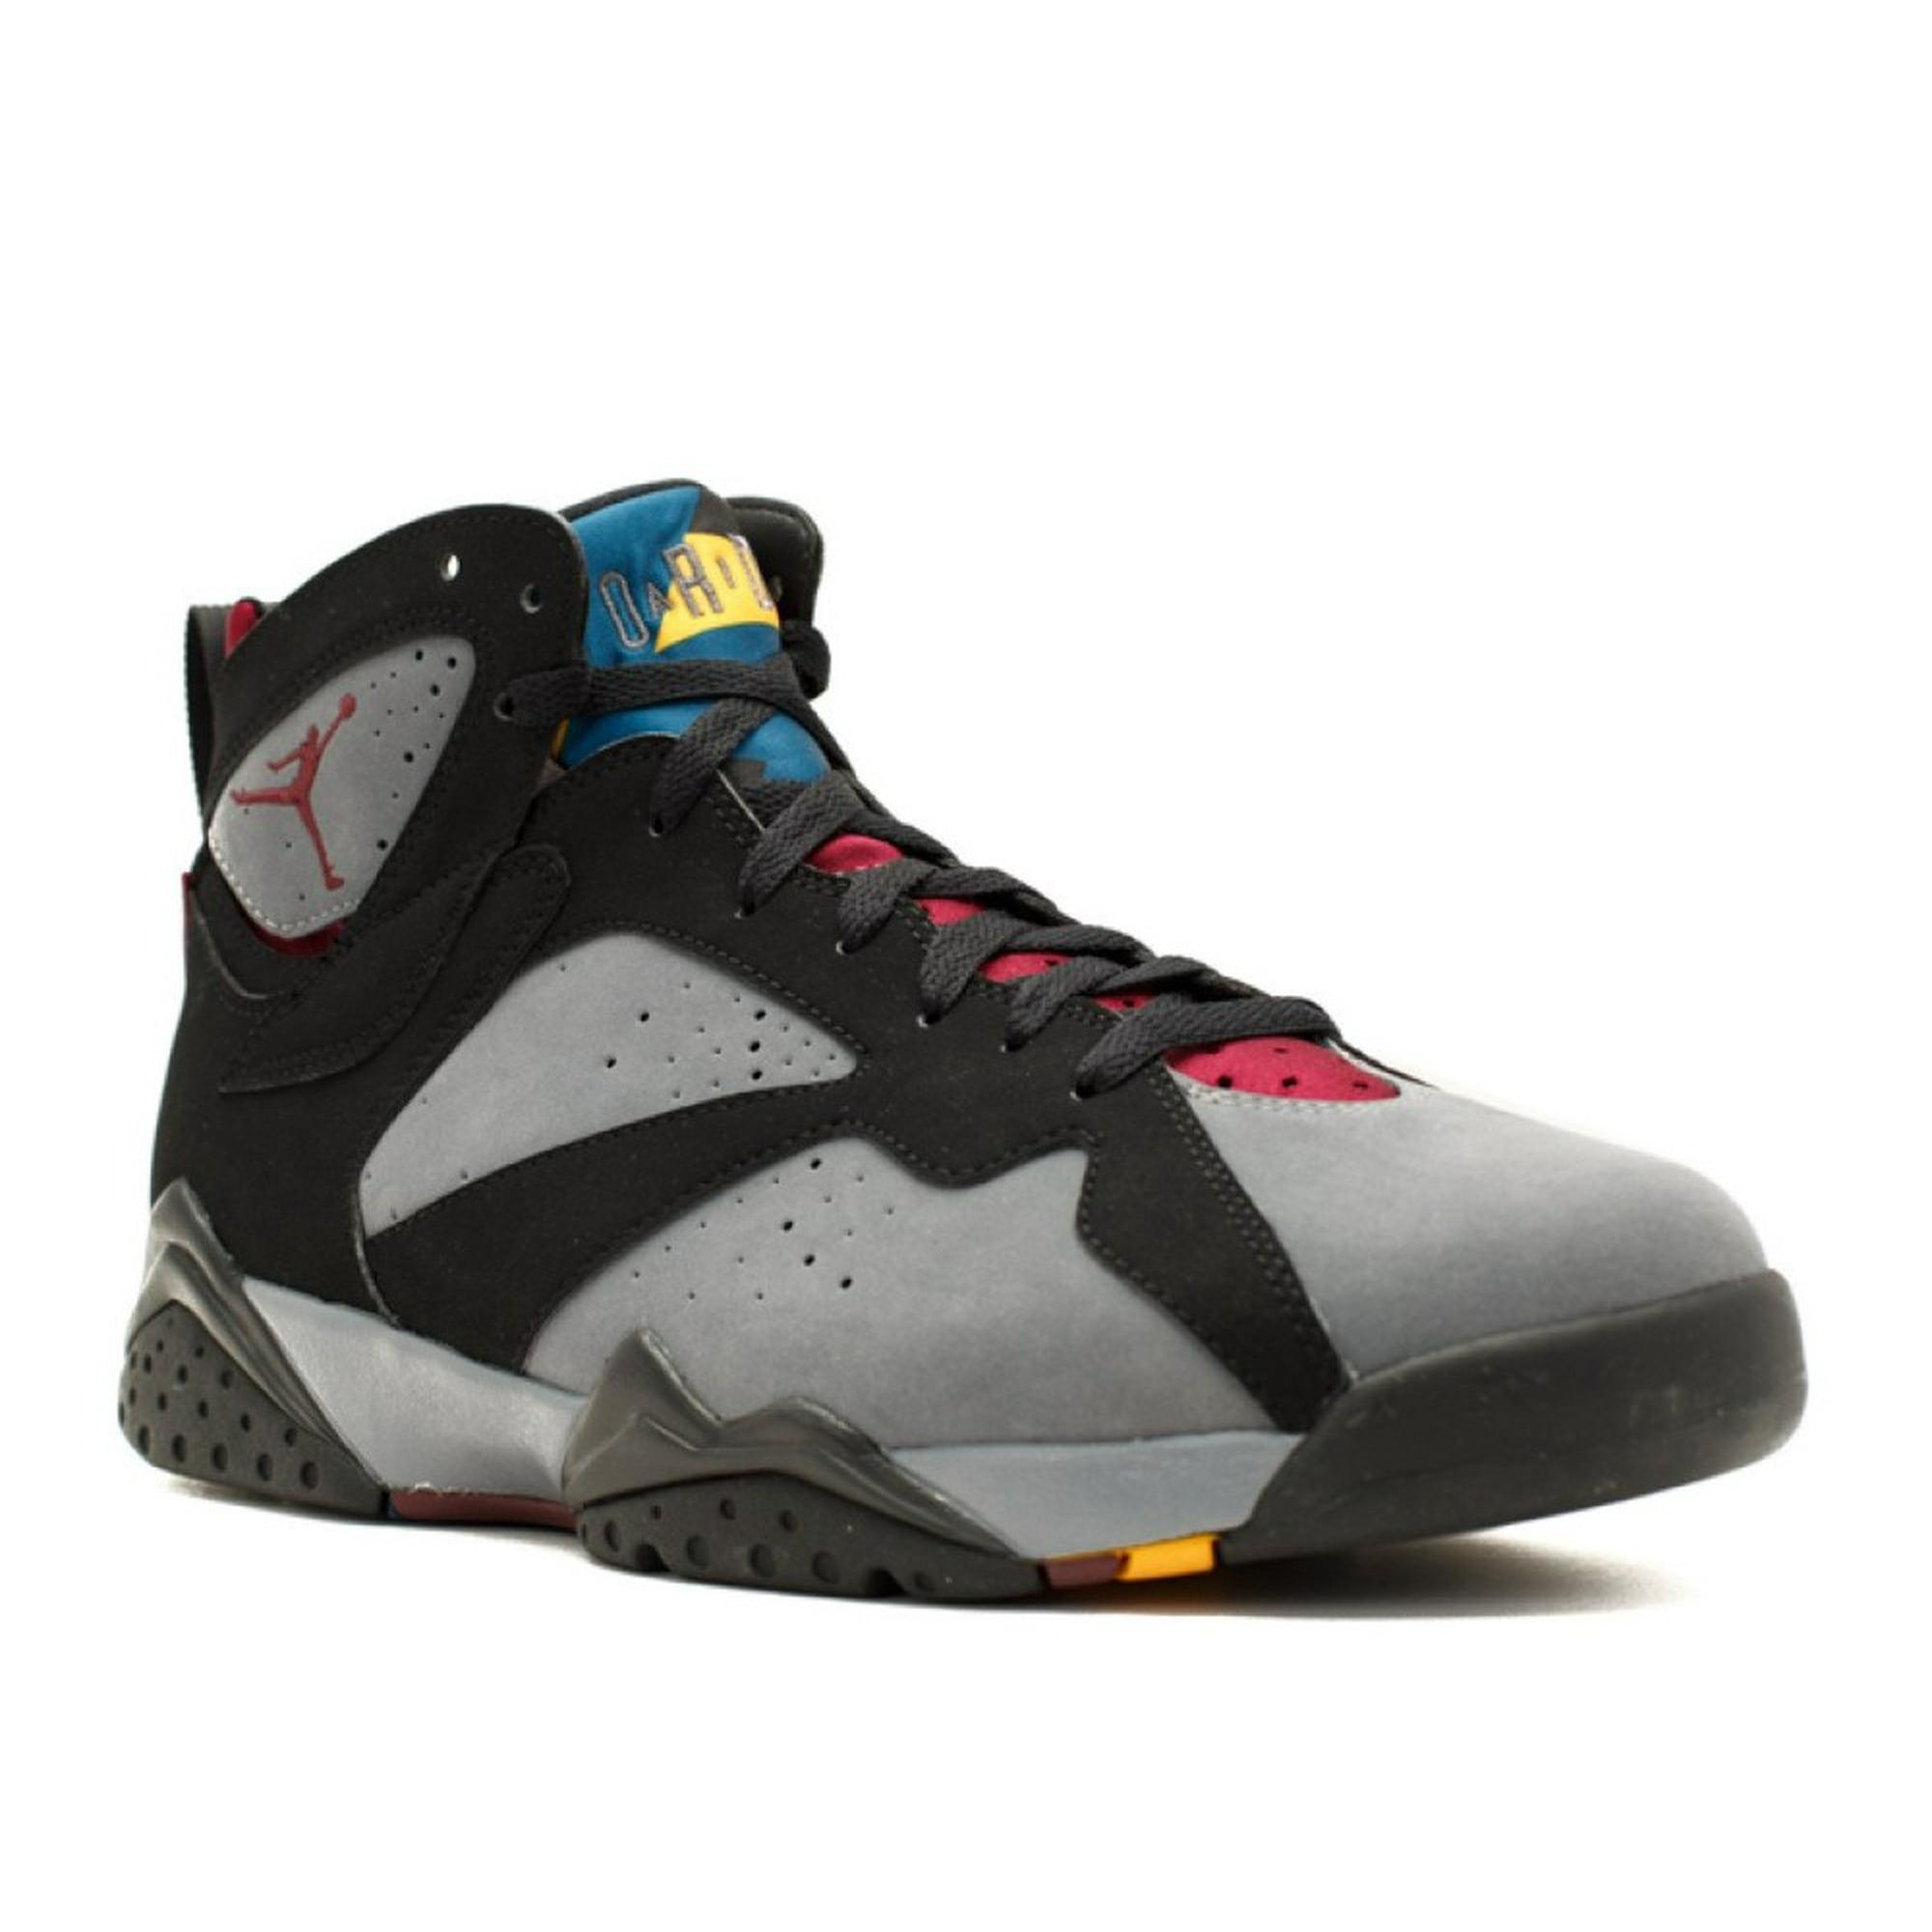 38464cb1882 Air Jordan - Men - Air Jordan 7 Retro 'Bordeaux 2011 Release' - 304775-003  - Size 15 | Walmart Canada